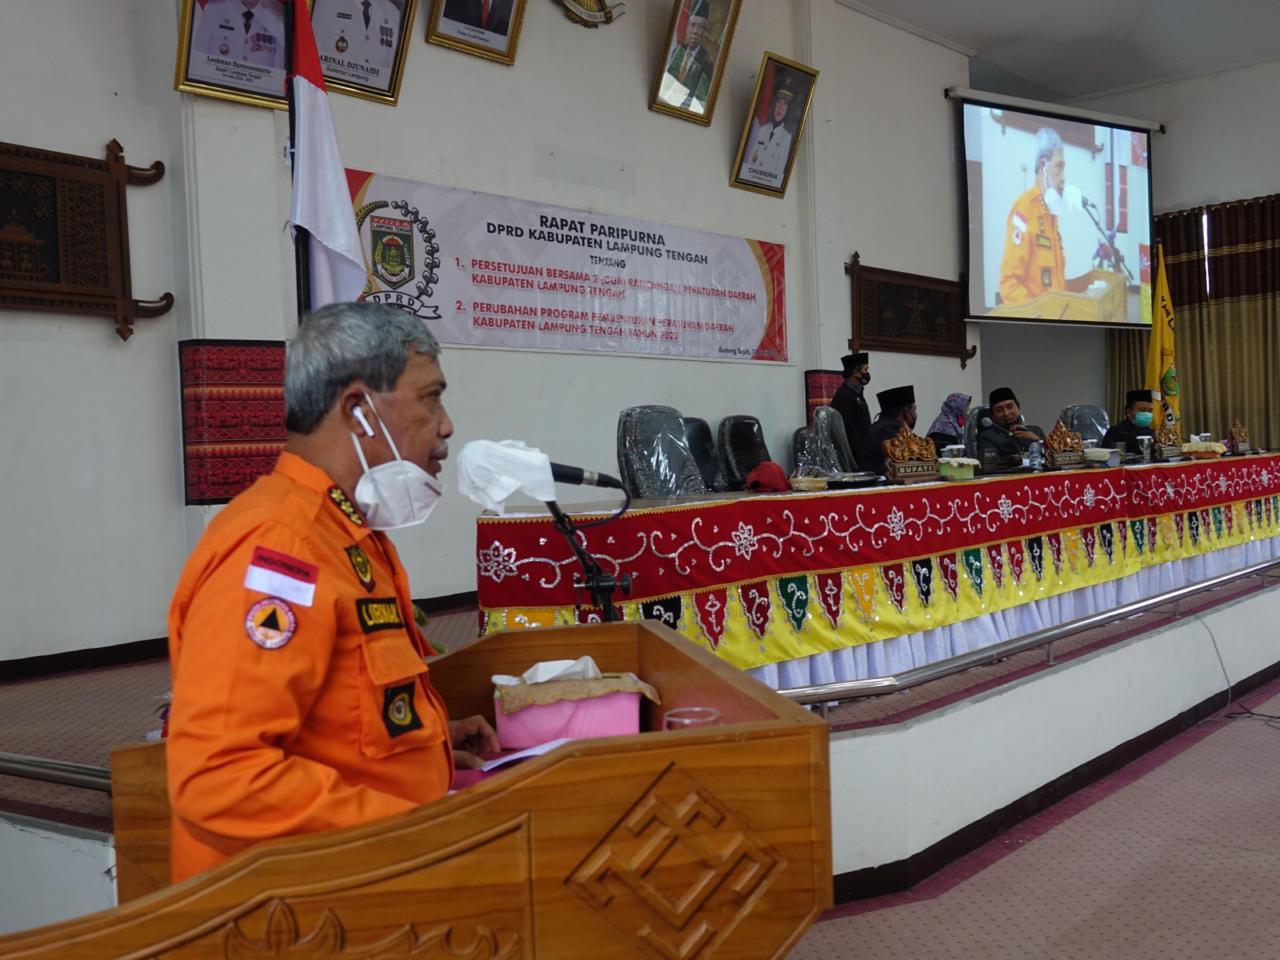 Bupati Loekman Hadiri Sidang Paripurna DPRD Lamteng